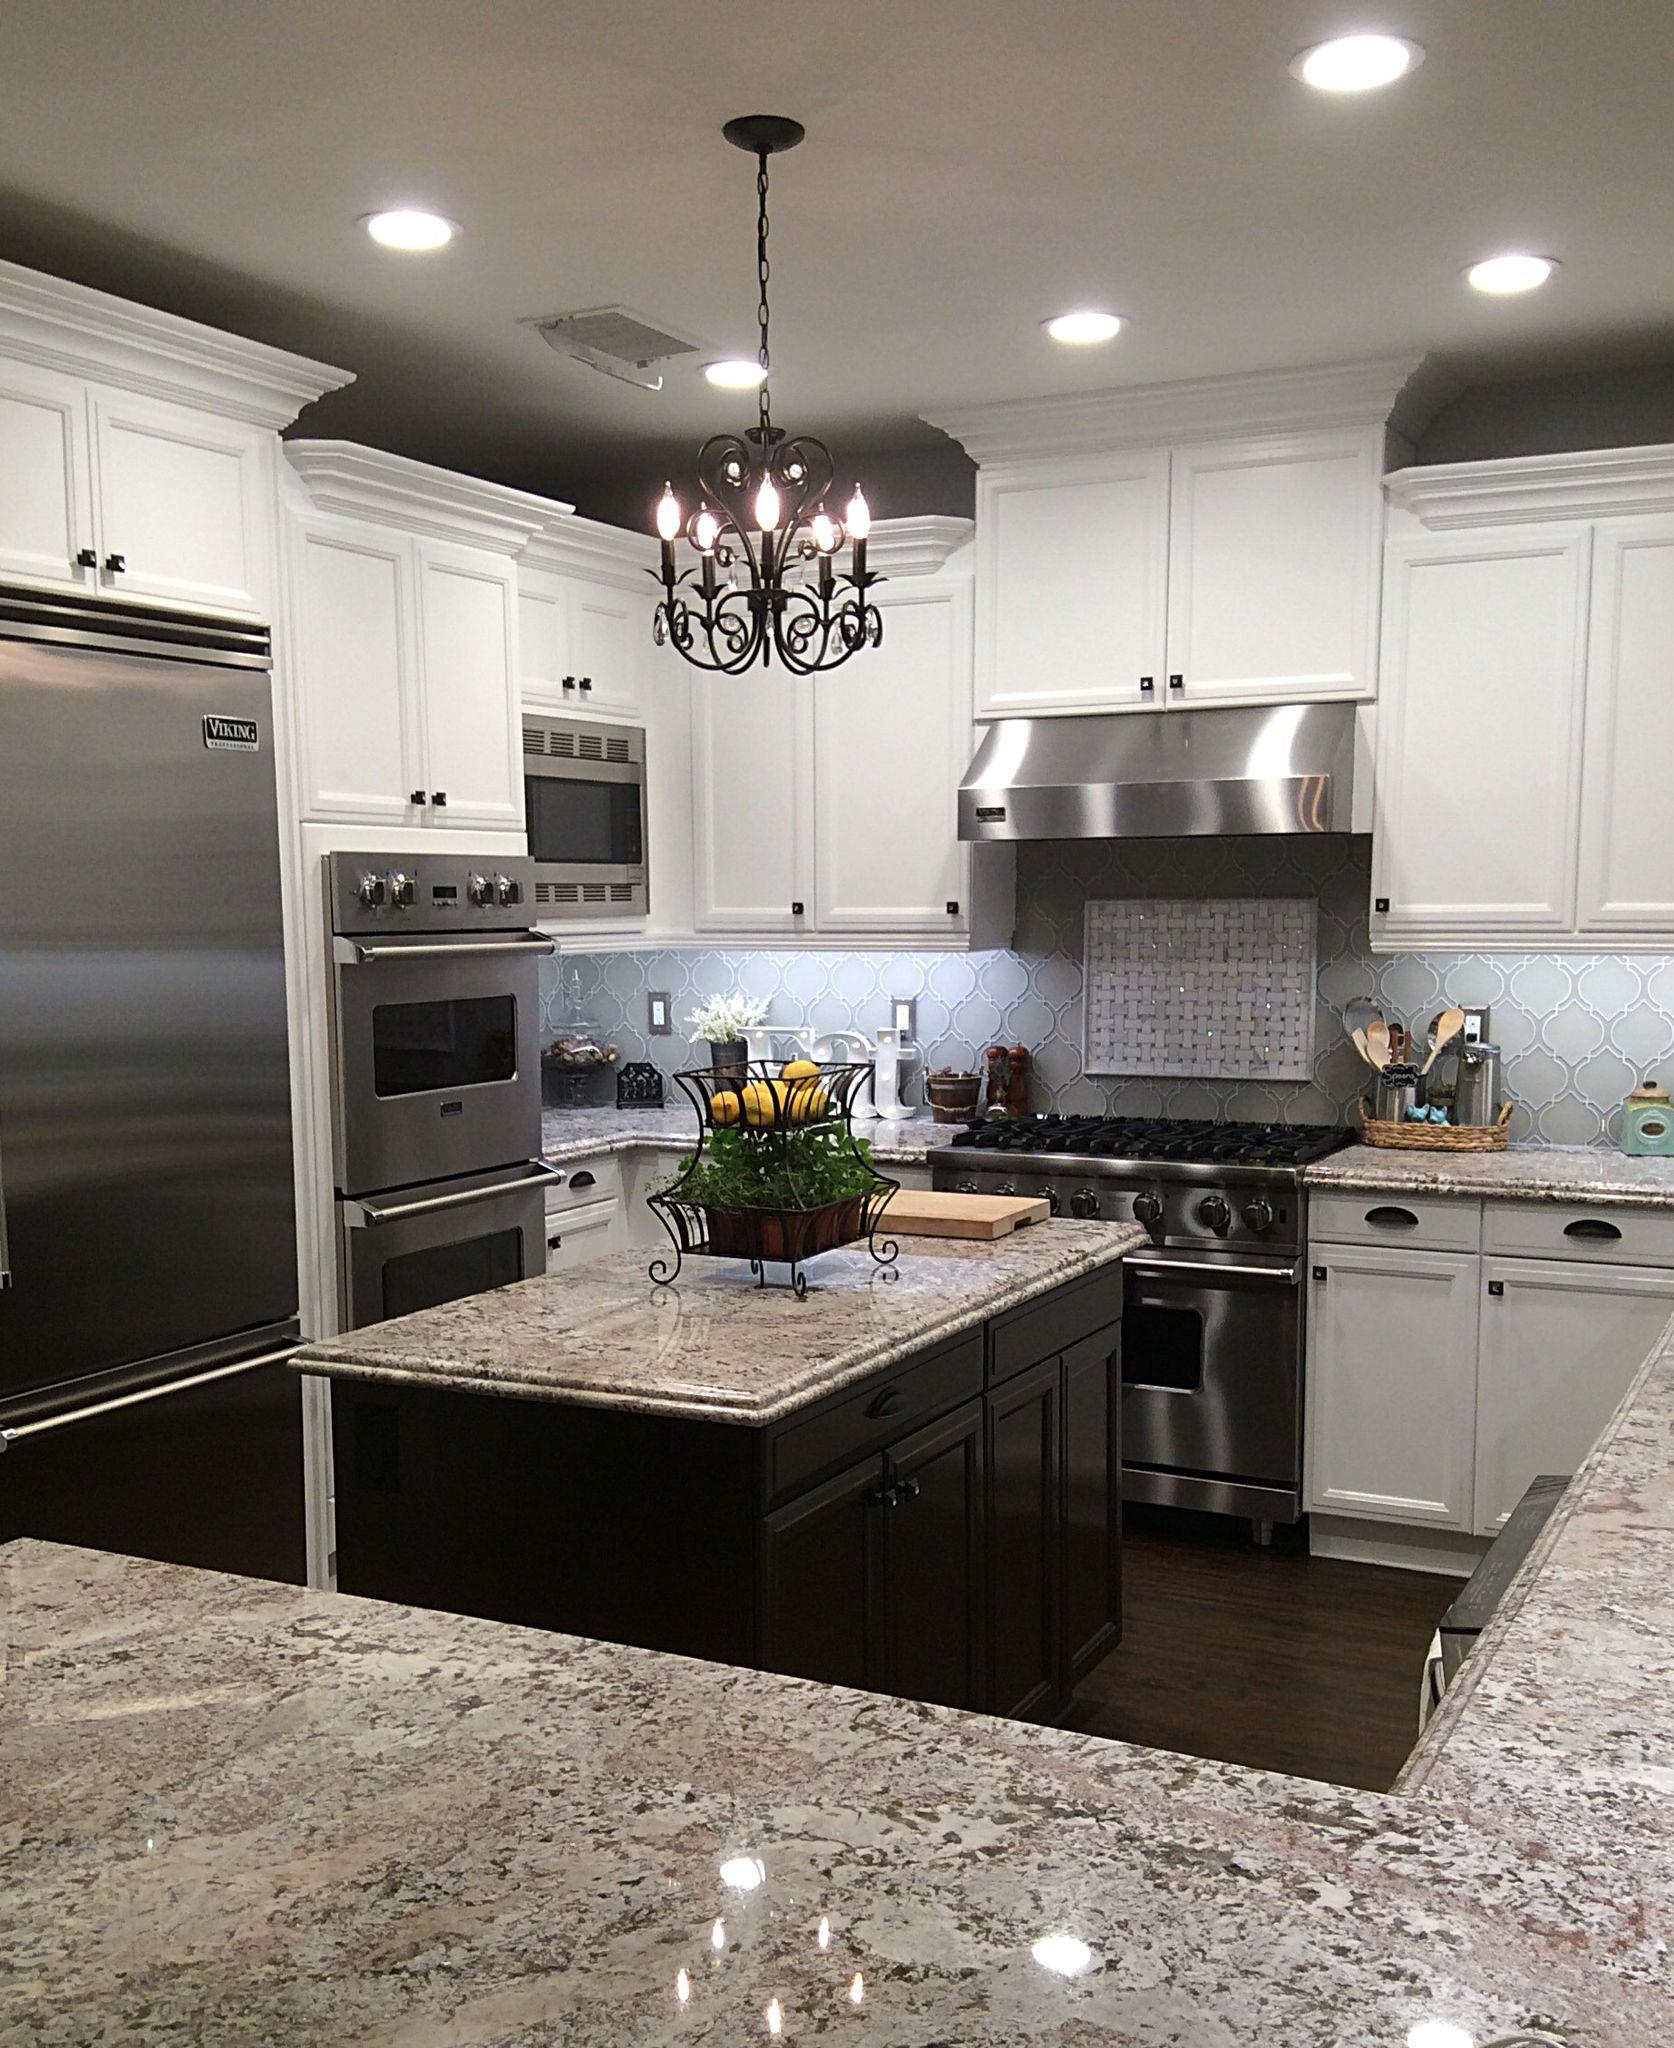 Rustic glam kitchen | Kitchen countertops | Pinterest | Cocinas ...